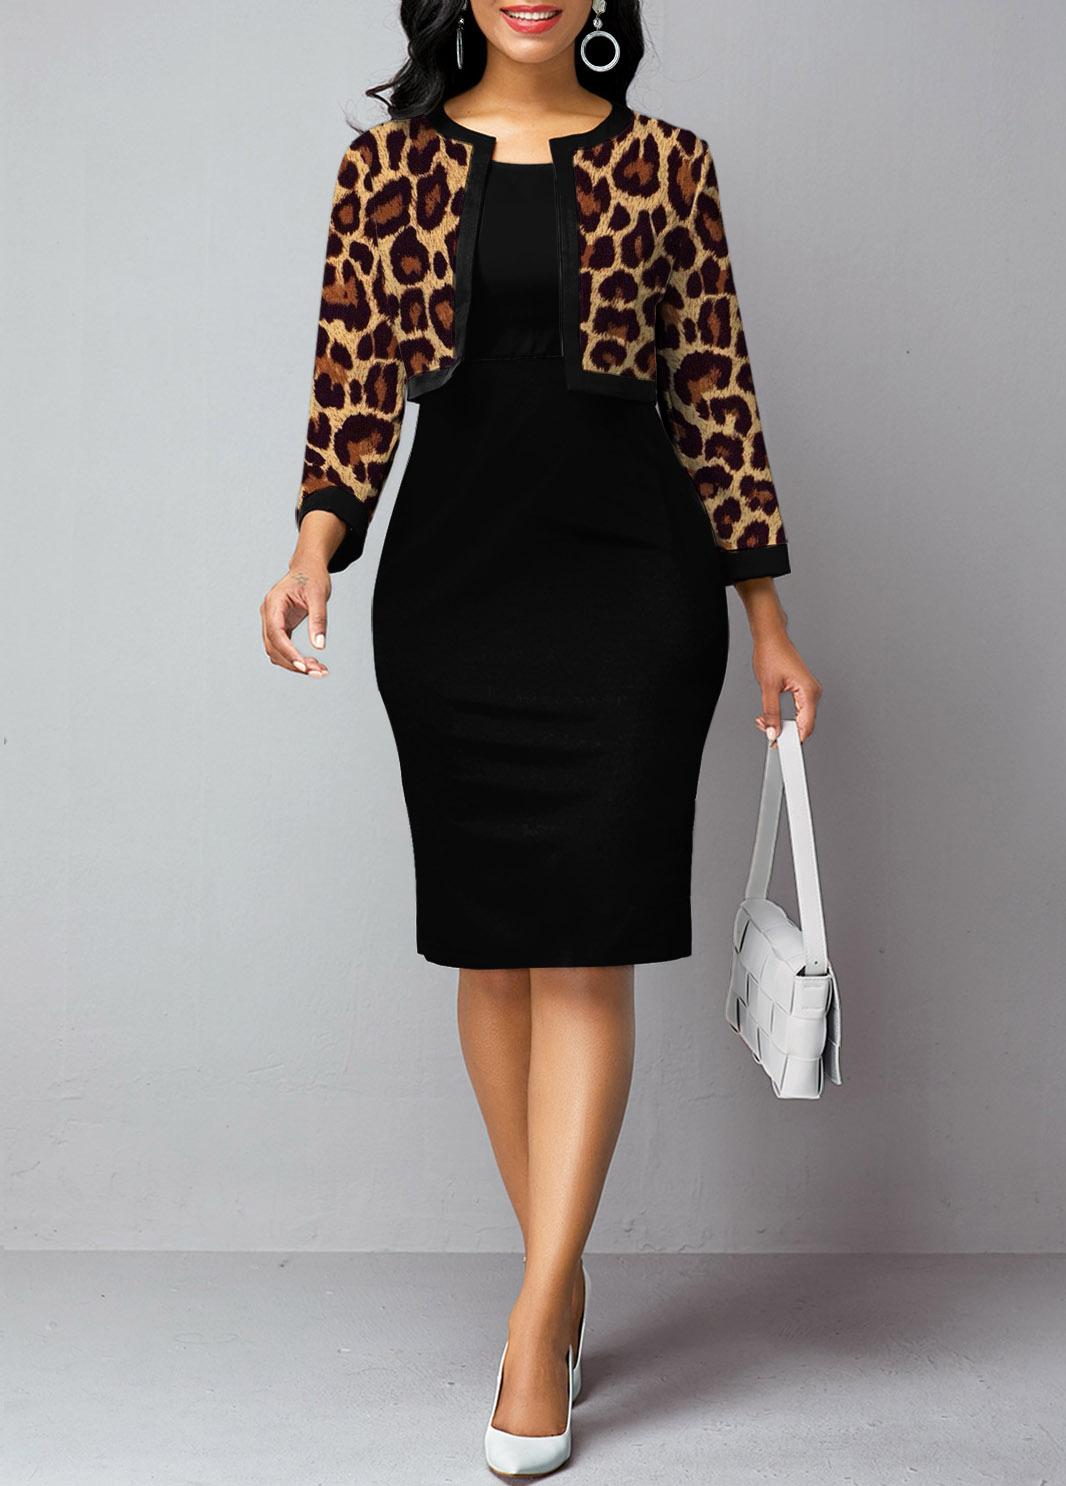 ROTITA Open Front Leopard 3/4 Sleeve Two Piece Dress